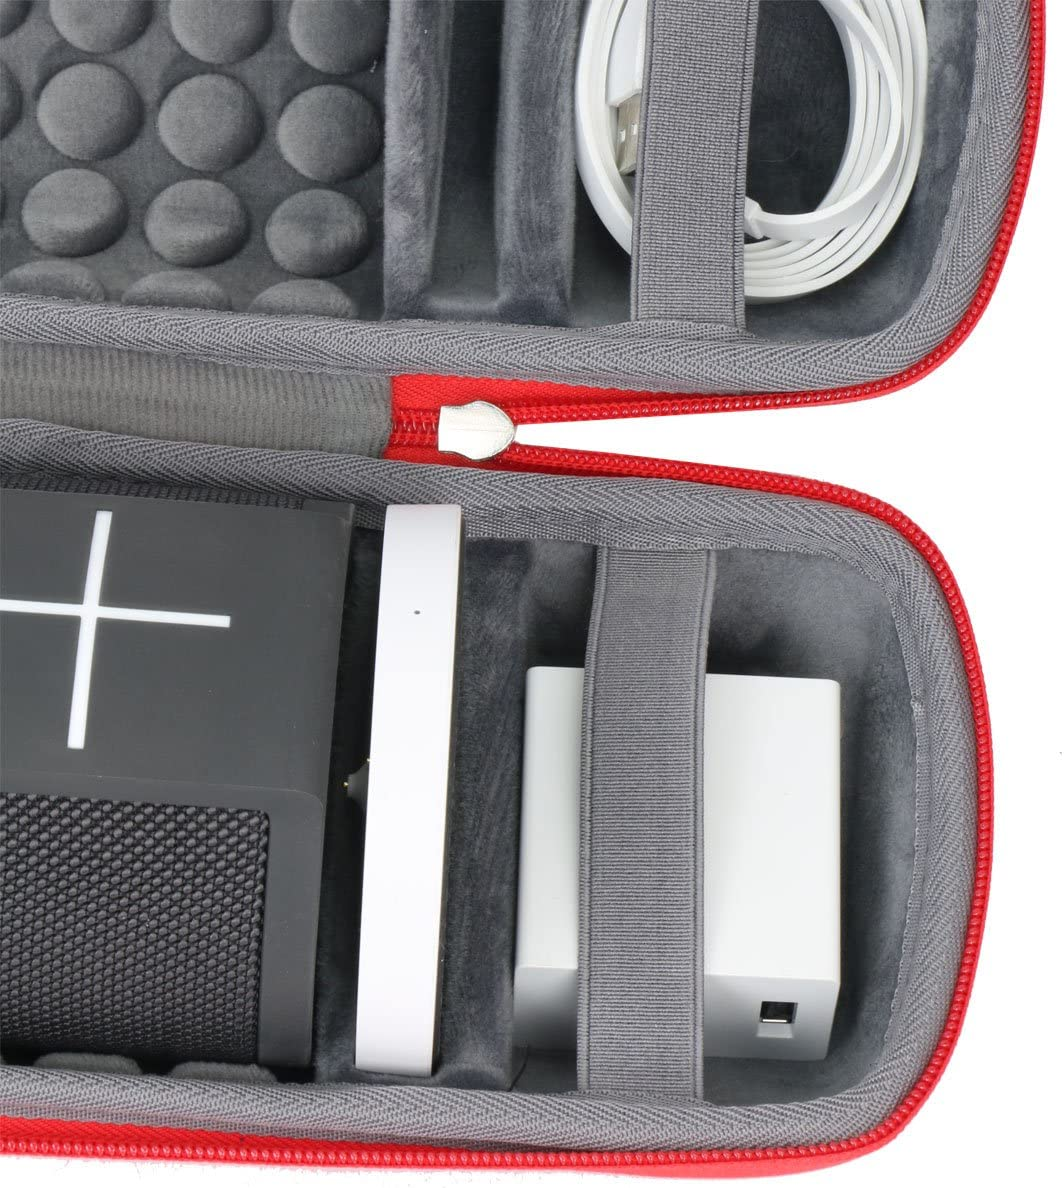 Hard Travel Case for Ultimate Ears MEGABLAST Portable Wi-Fi Bluetooth Speaker by co2CREA Black